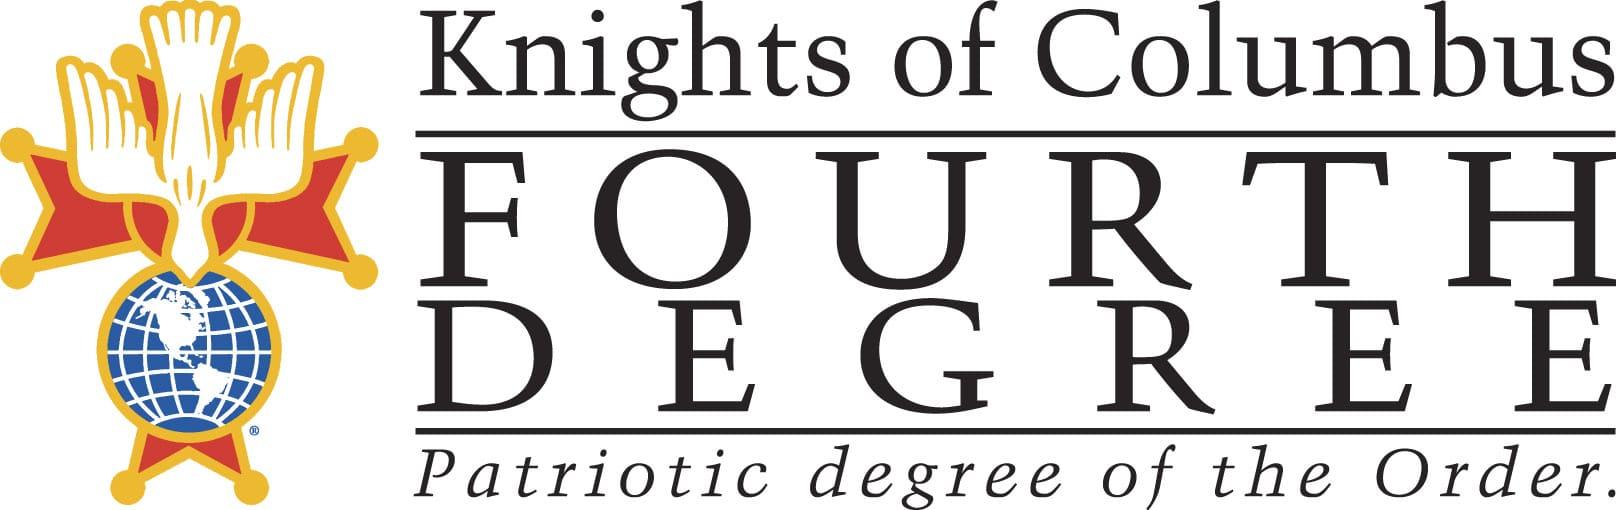 4th Degree Emblem